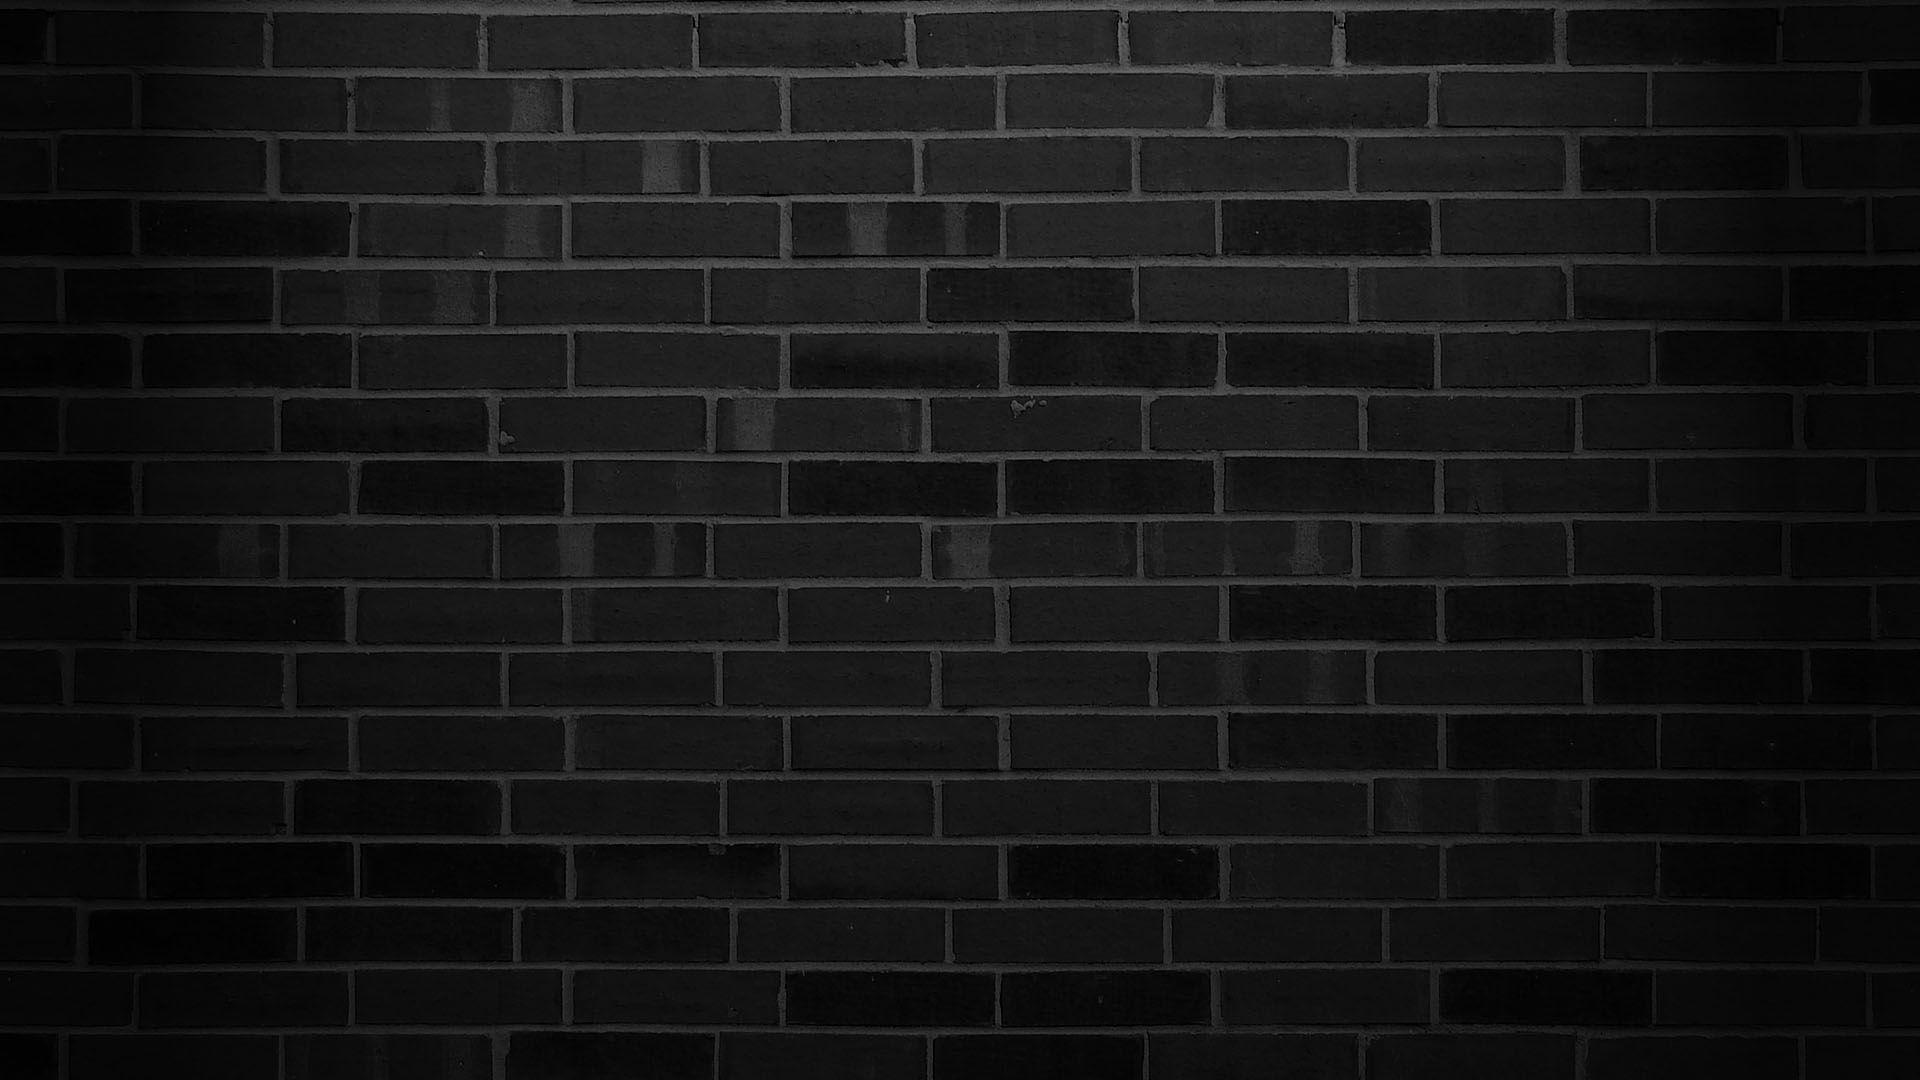 Bricks wallpaper Brick wall wallpaper, Black brick